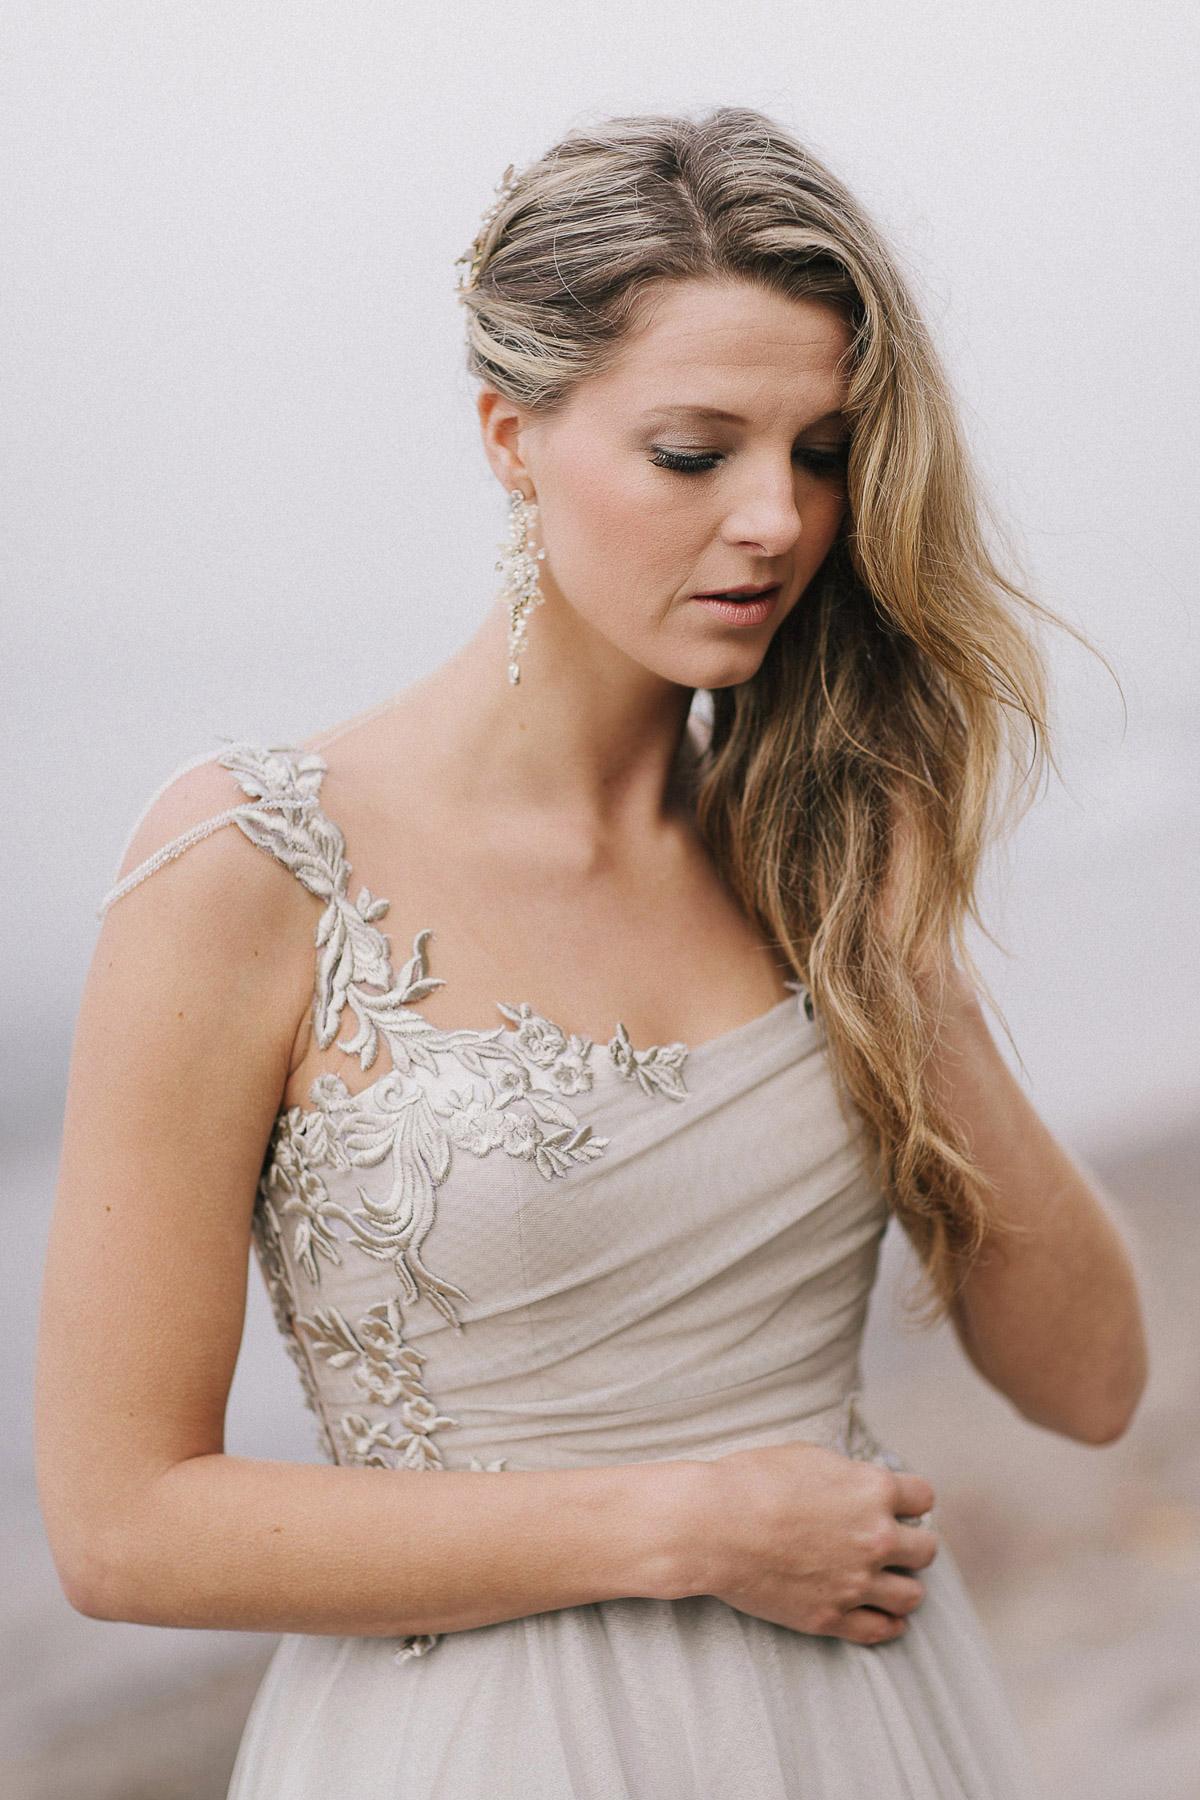 ballad-photography-vineyard-bride-swish-list-niagara-seaside-wedding-editorial-17.jpg